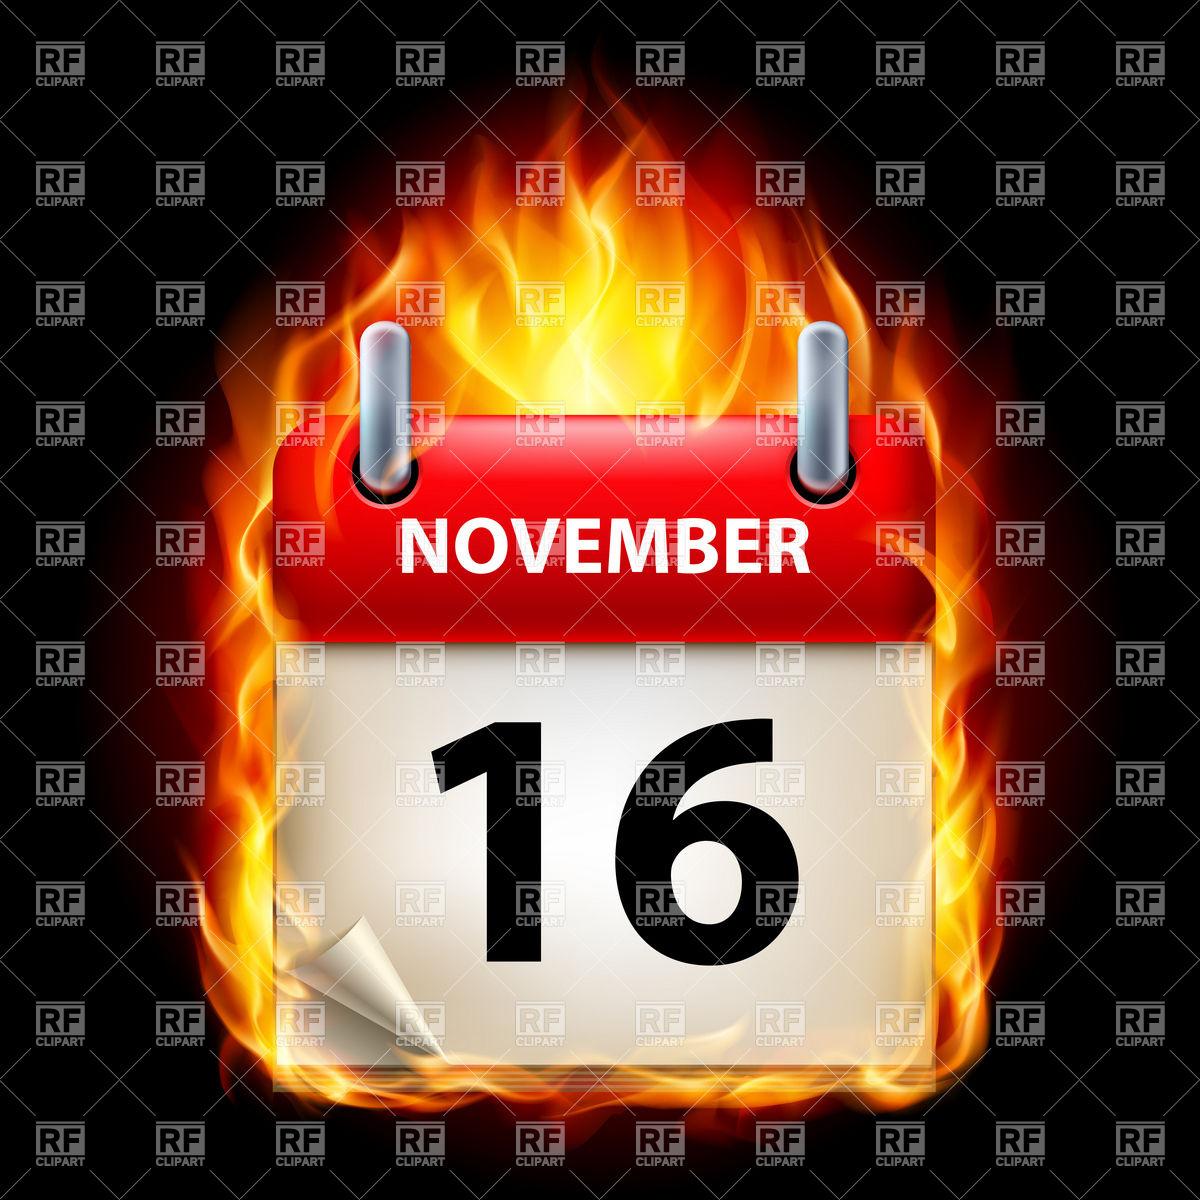 16 Of November In Burning Calendar Icon Stock Vector Image within November Calendar Clipart Free